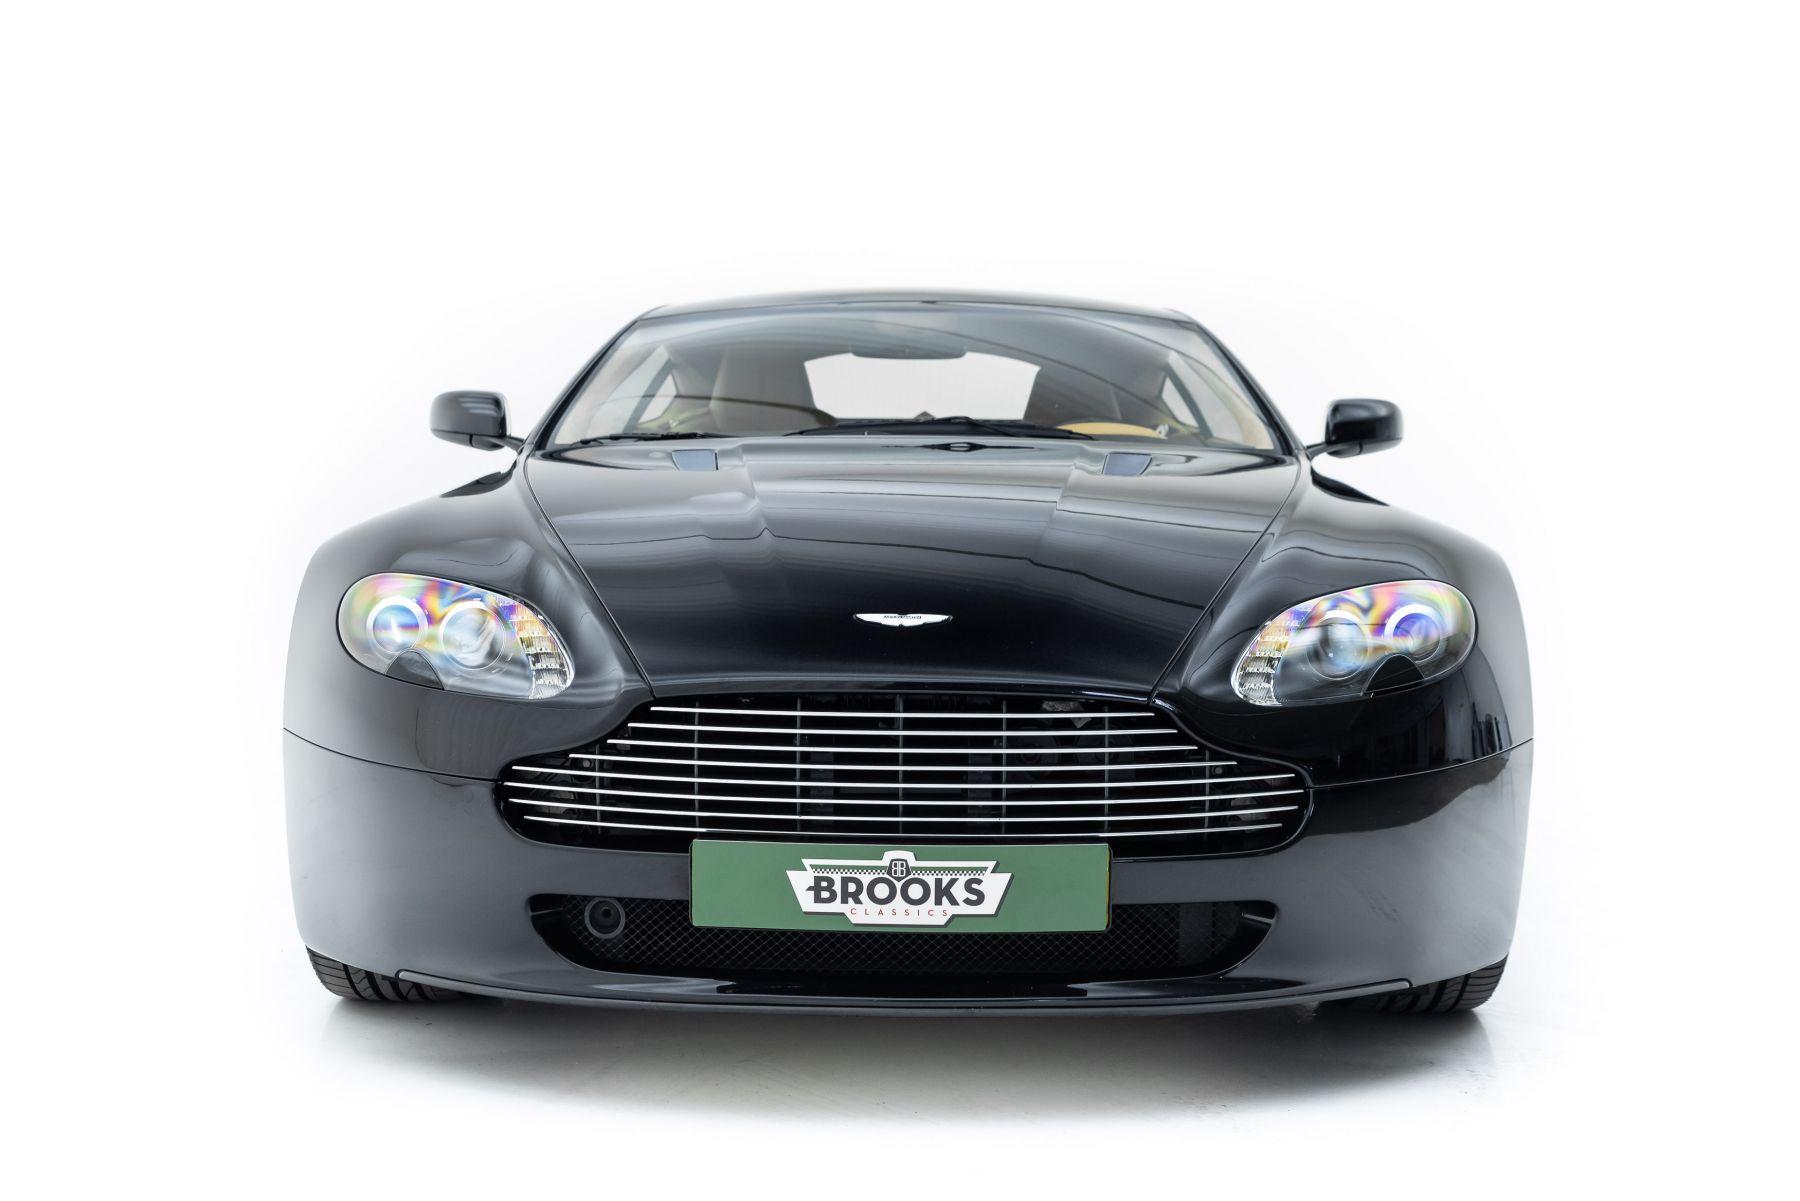 Aston Martin V8 Vantage Sportshift For Sale Brooks Classics Klassiekers Youngtimers